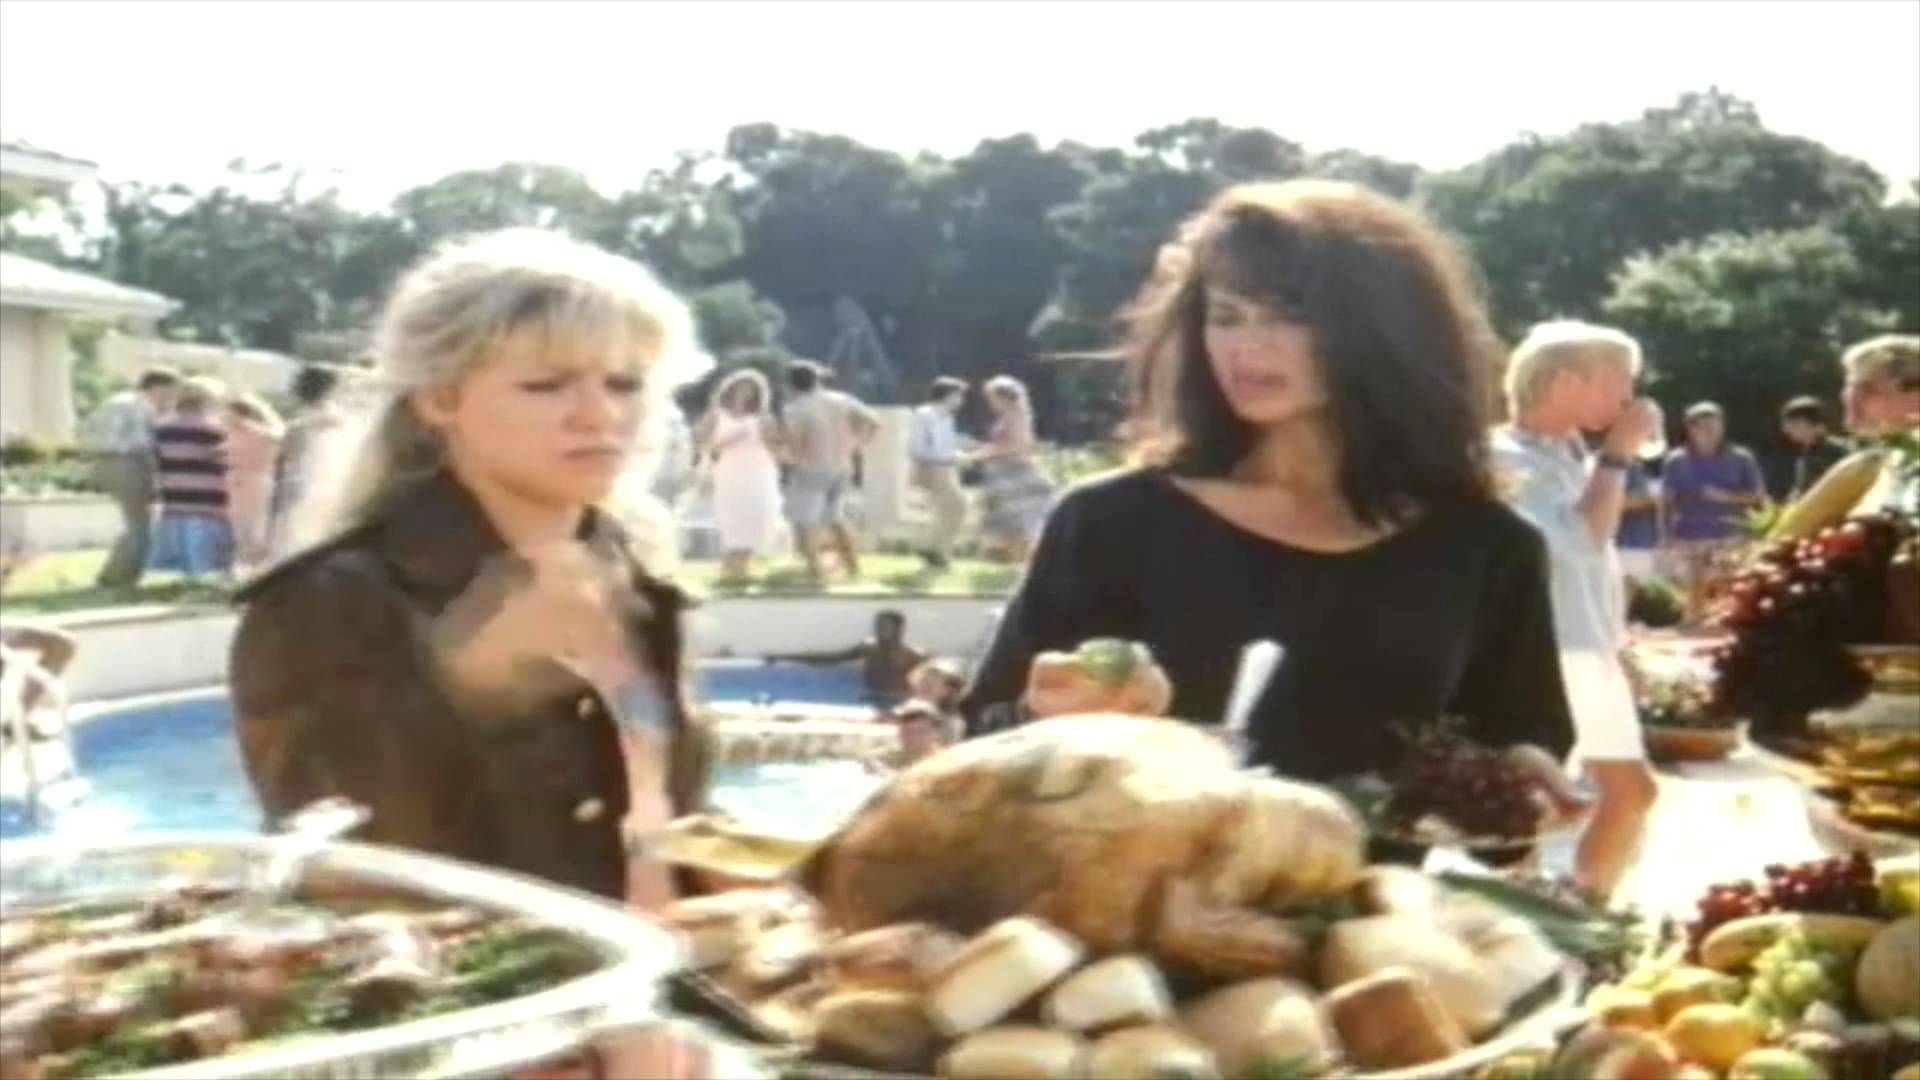 Satisfaction Trailer 1988 Movie with Justine Bateman is